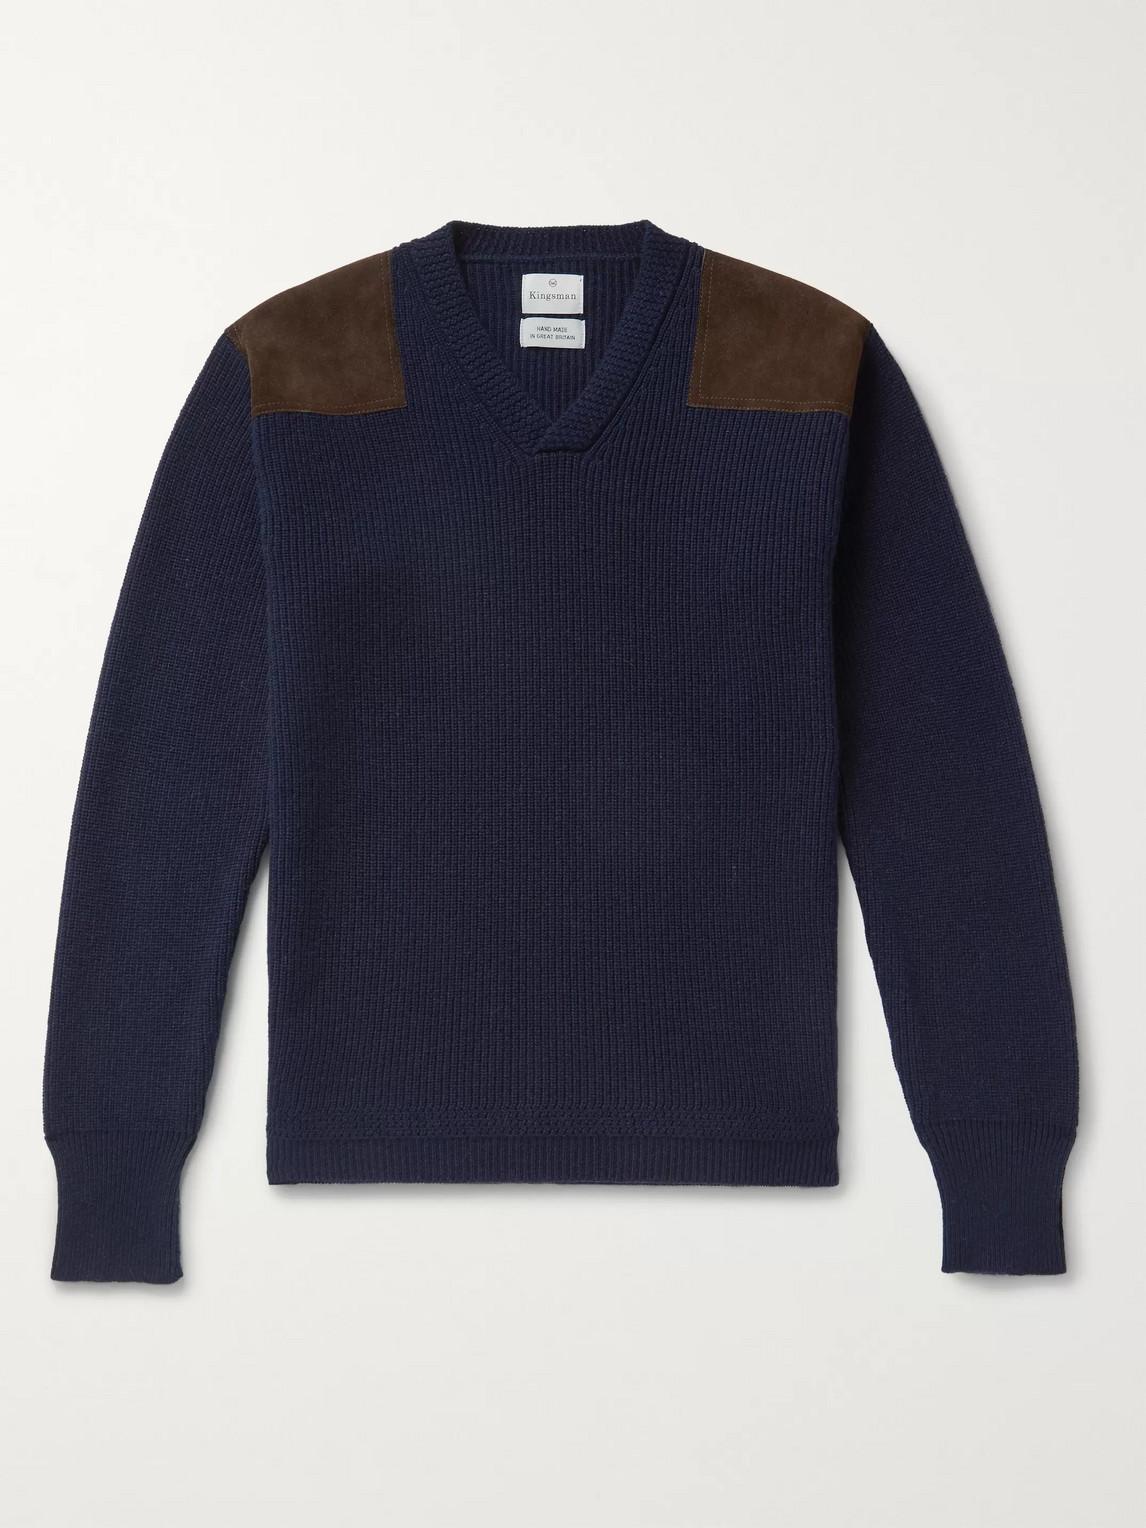 Kingsman Merlin Slim-fit Suede-trimmed Cashmere Sweater In Blue